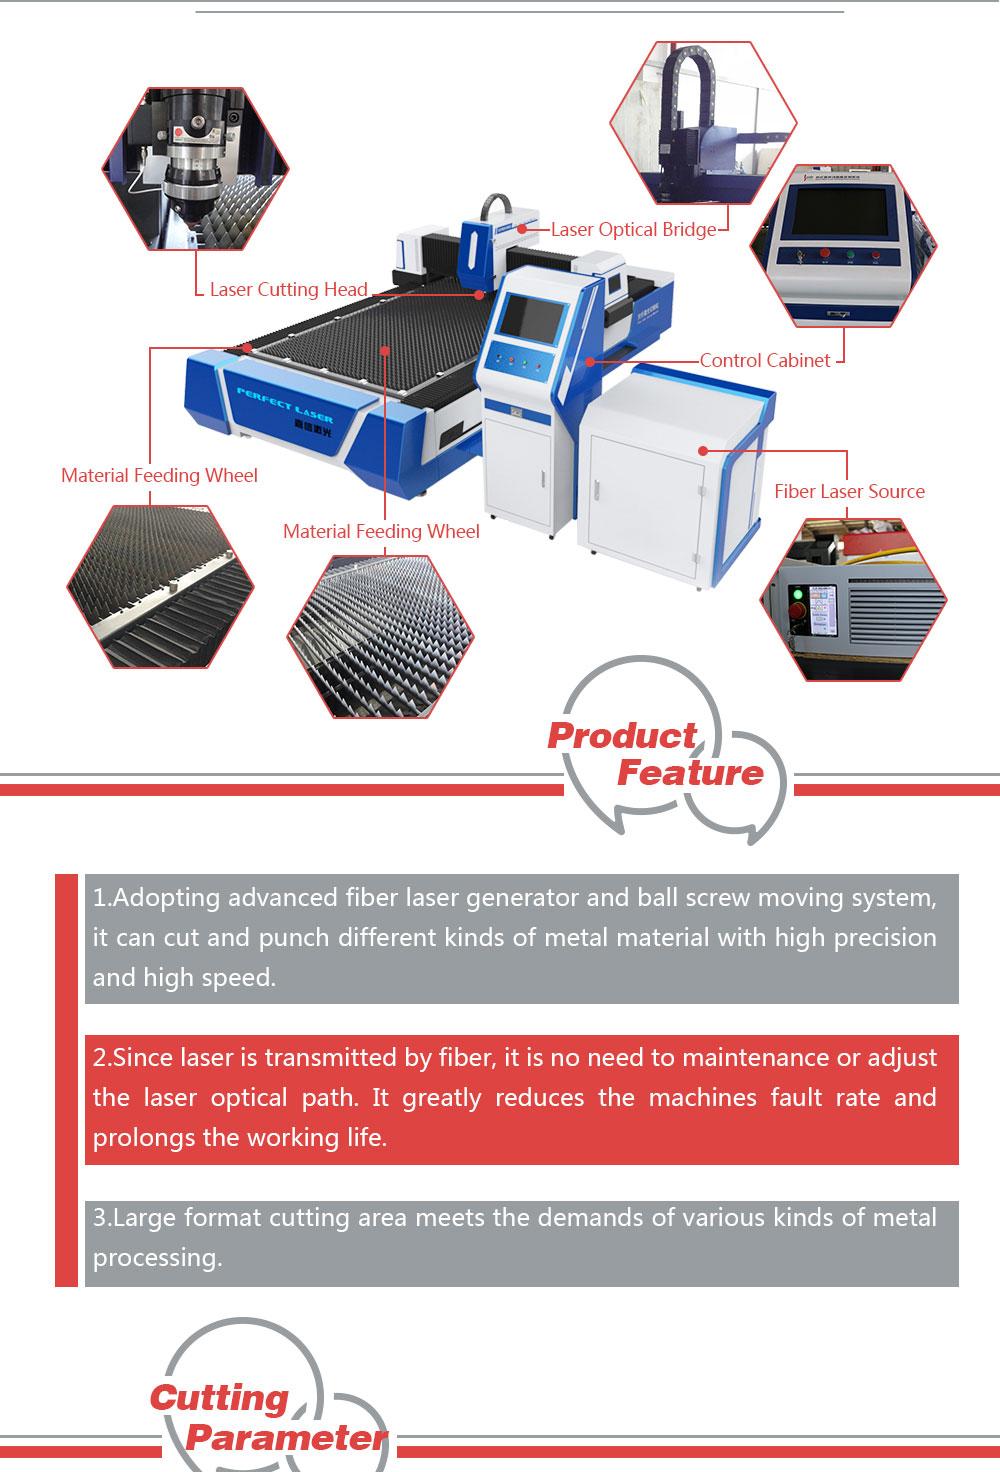 03 Perfect Laser-Fiber Laser Cutting Machine.jpg